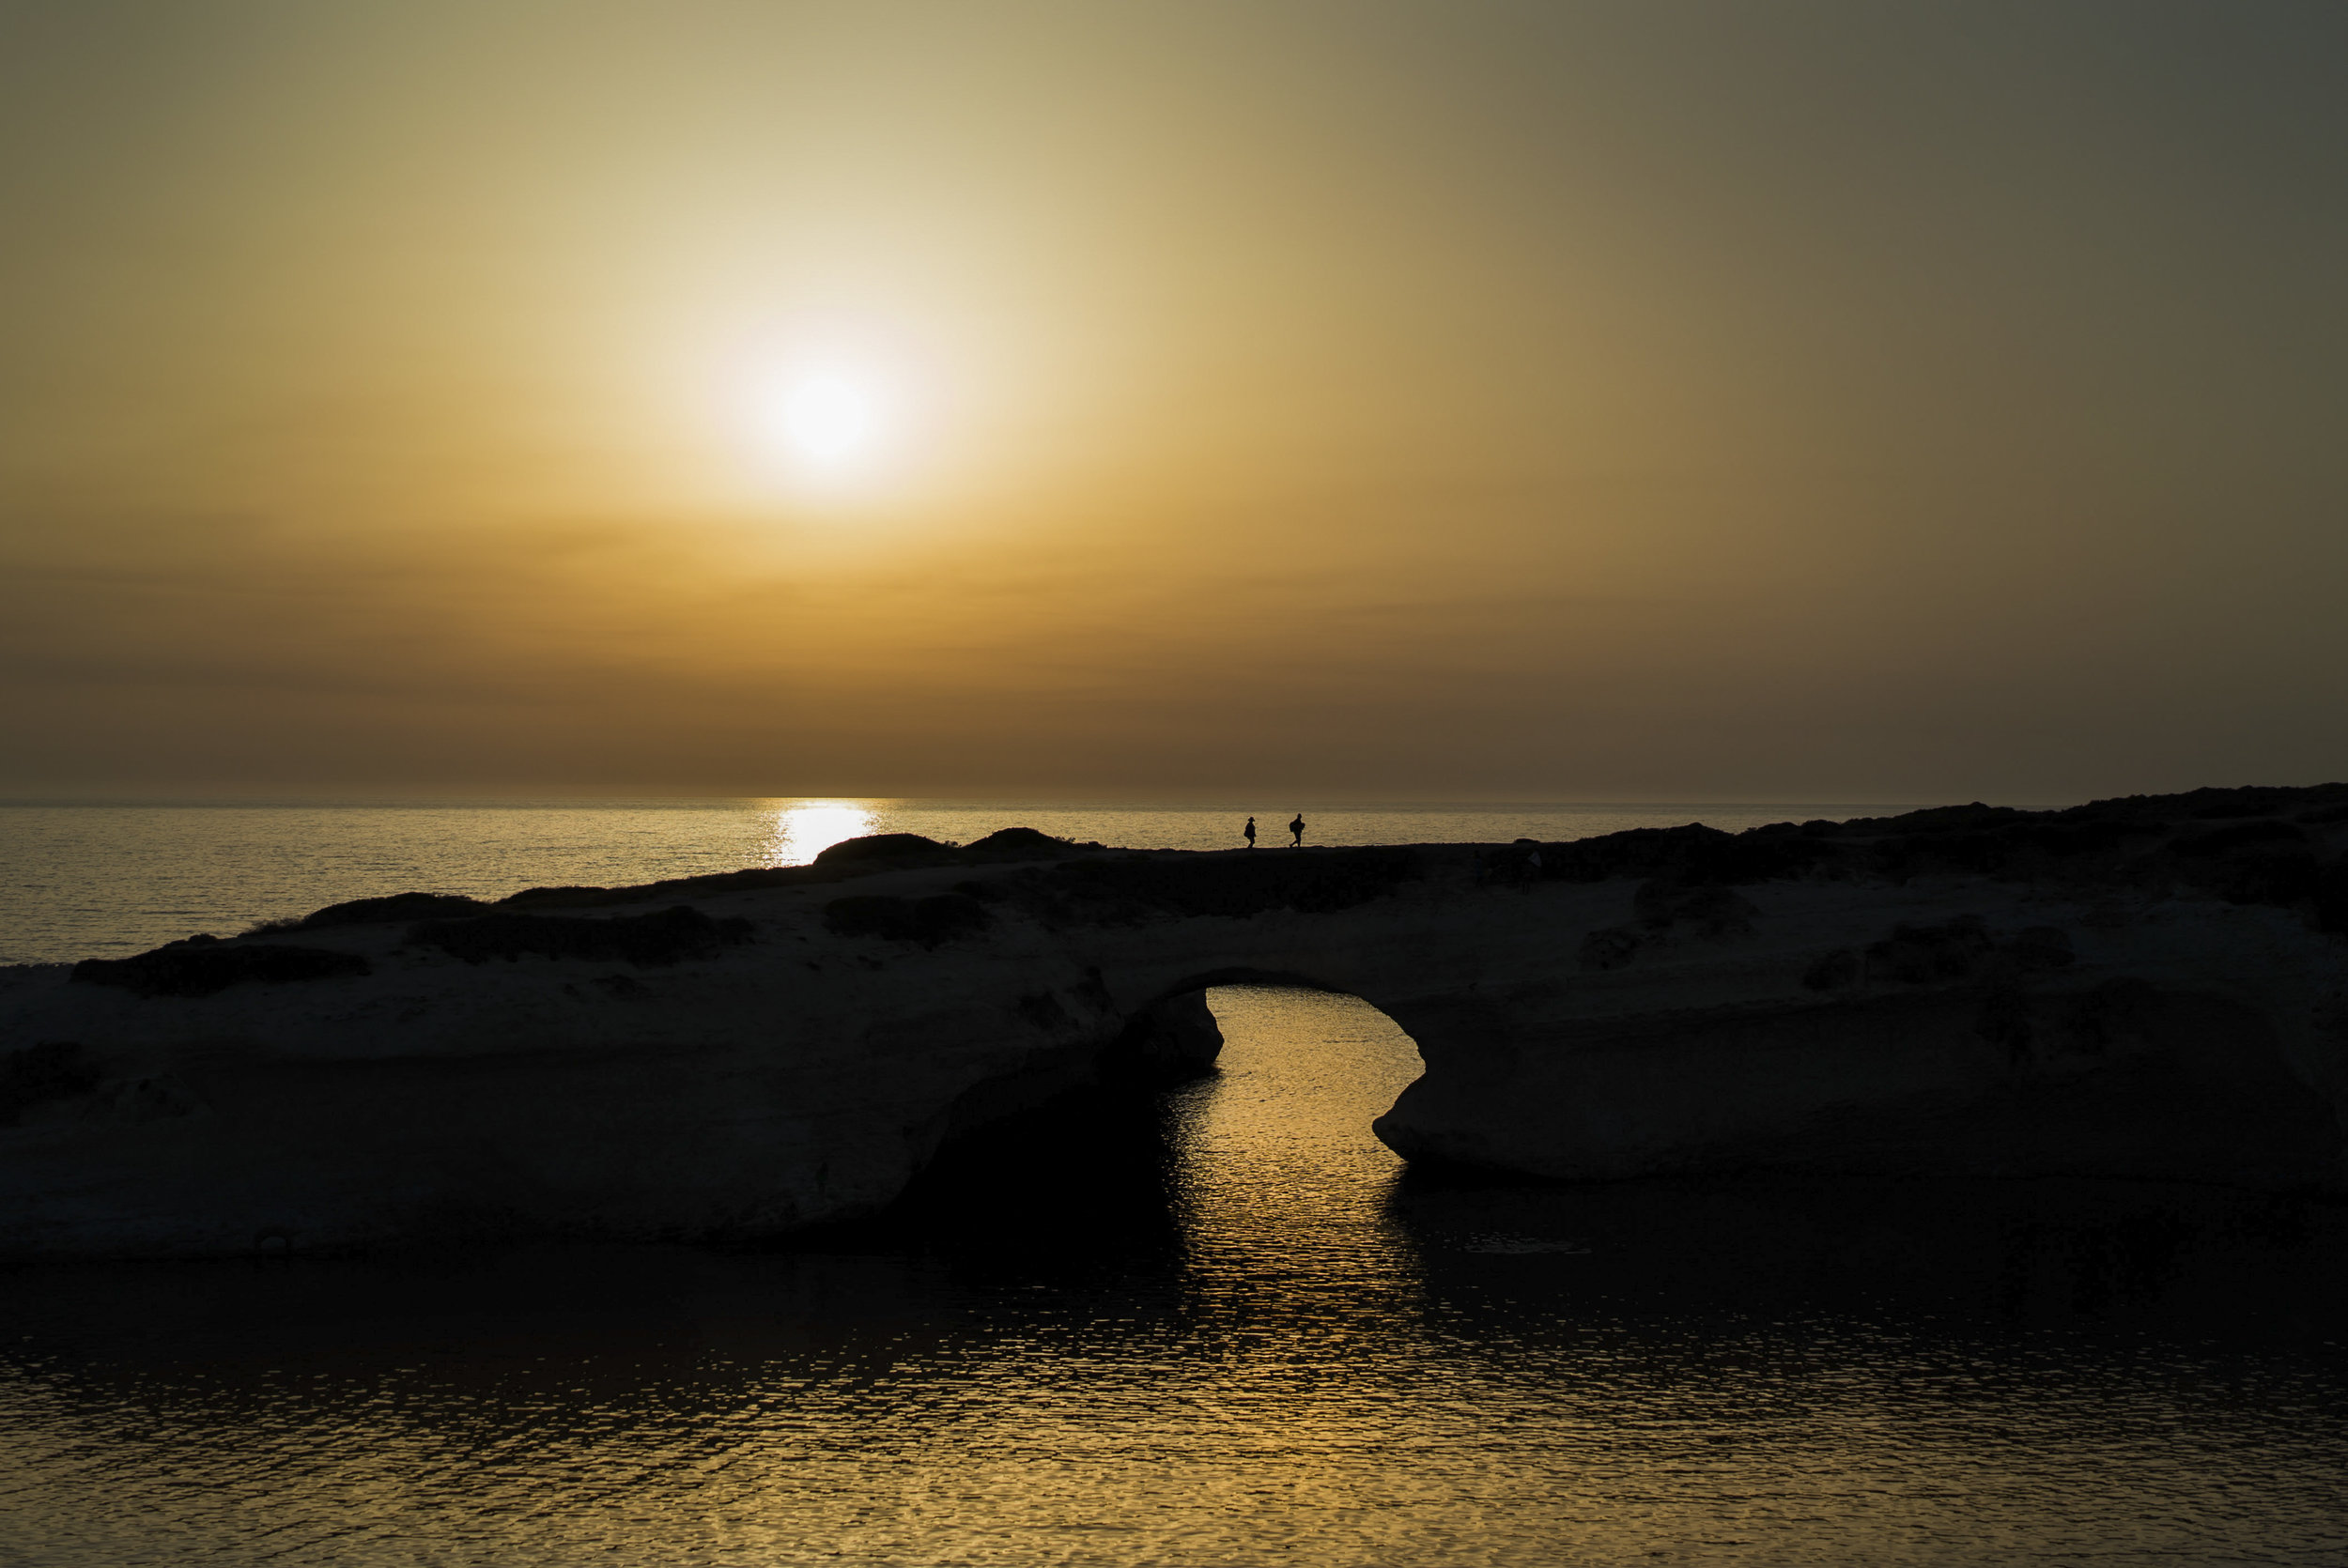 S'Archittu sunset - Sardinia